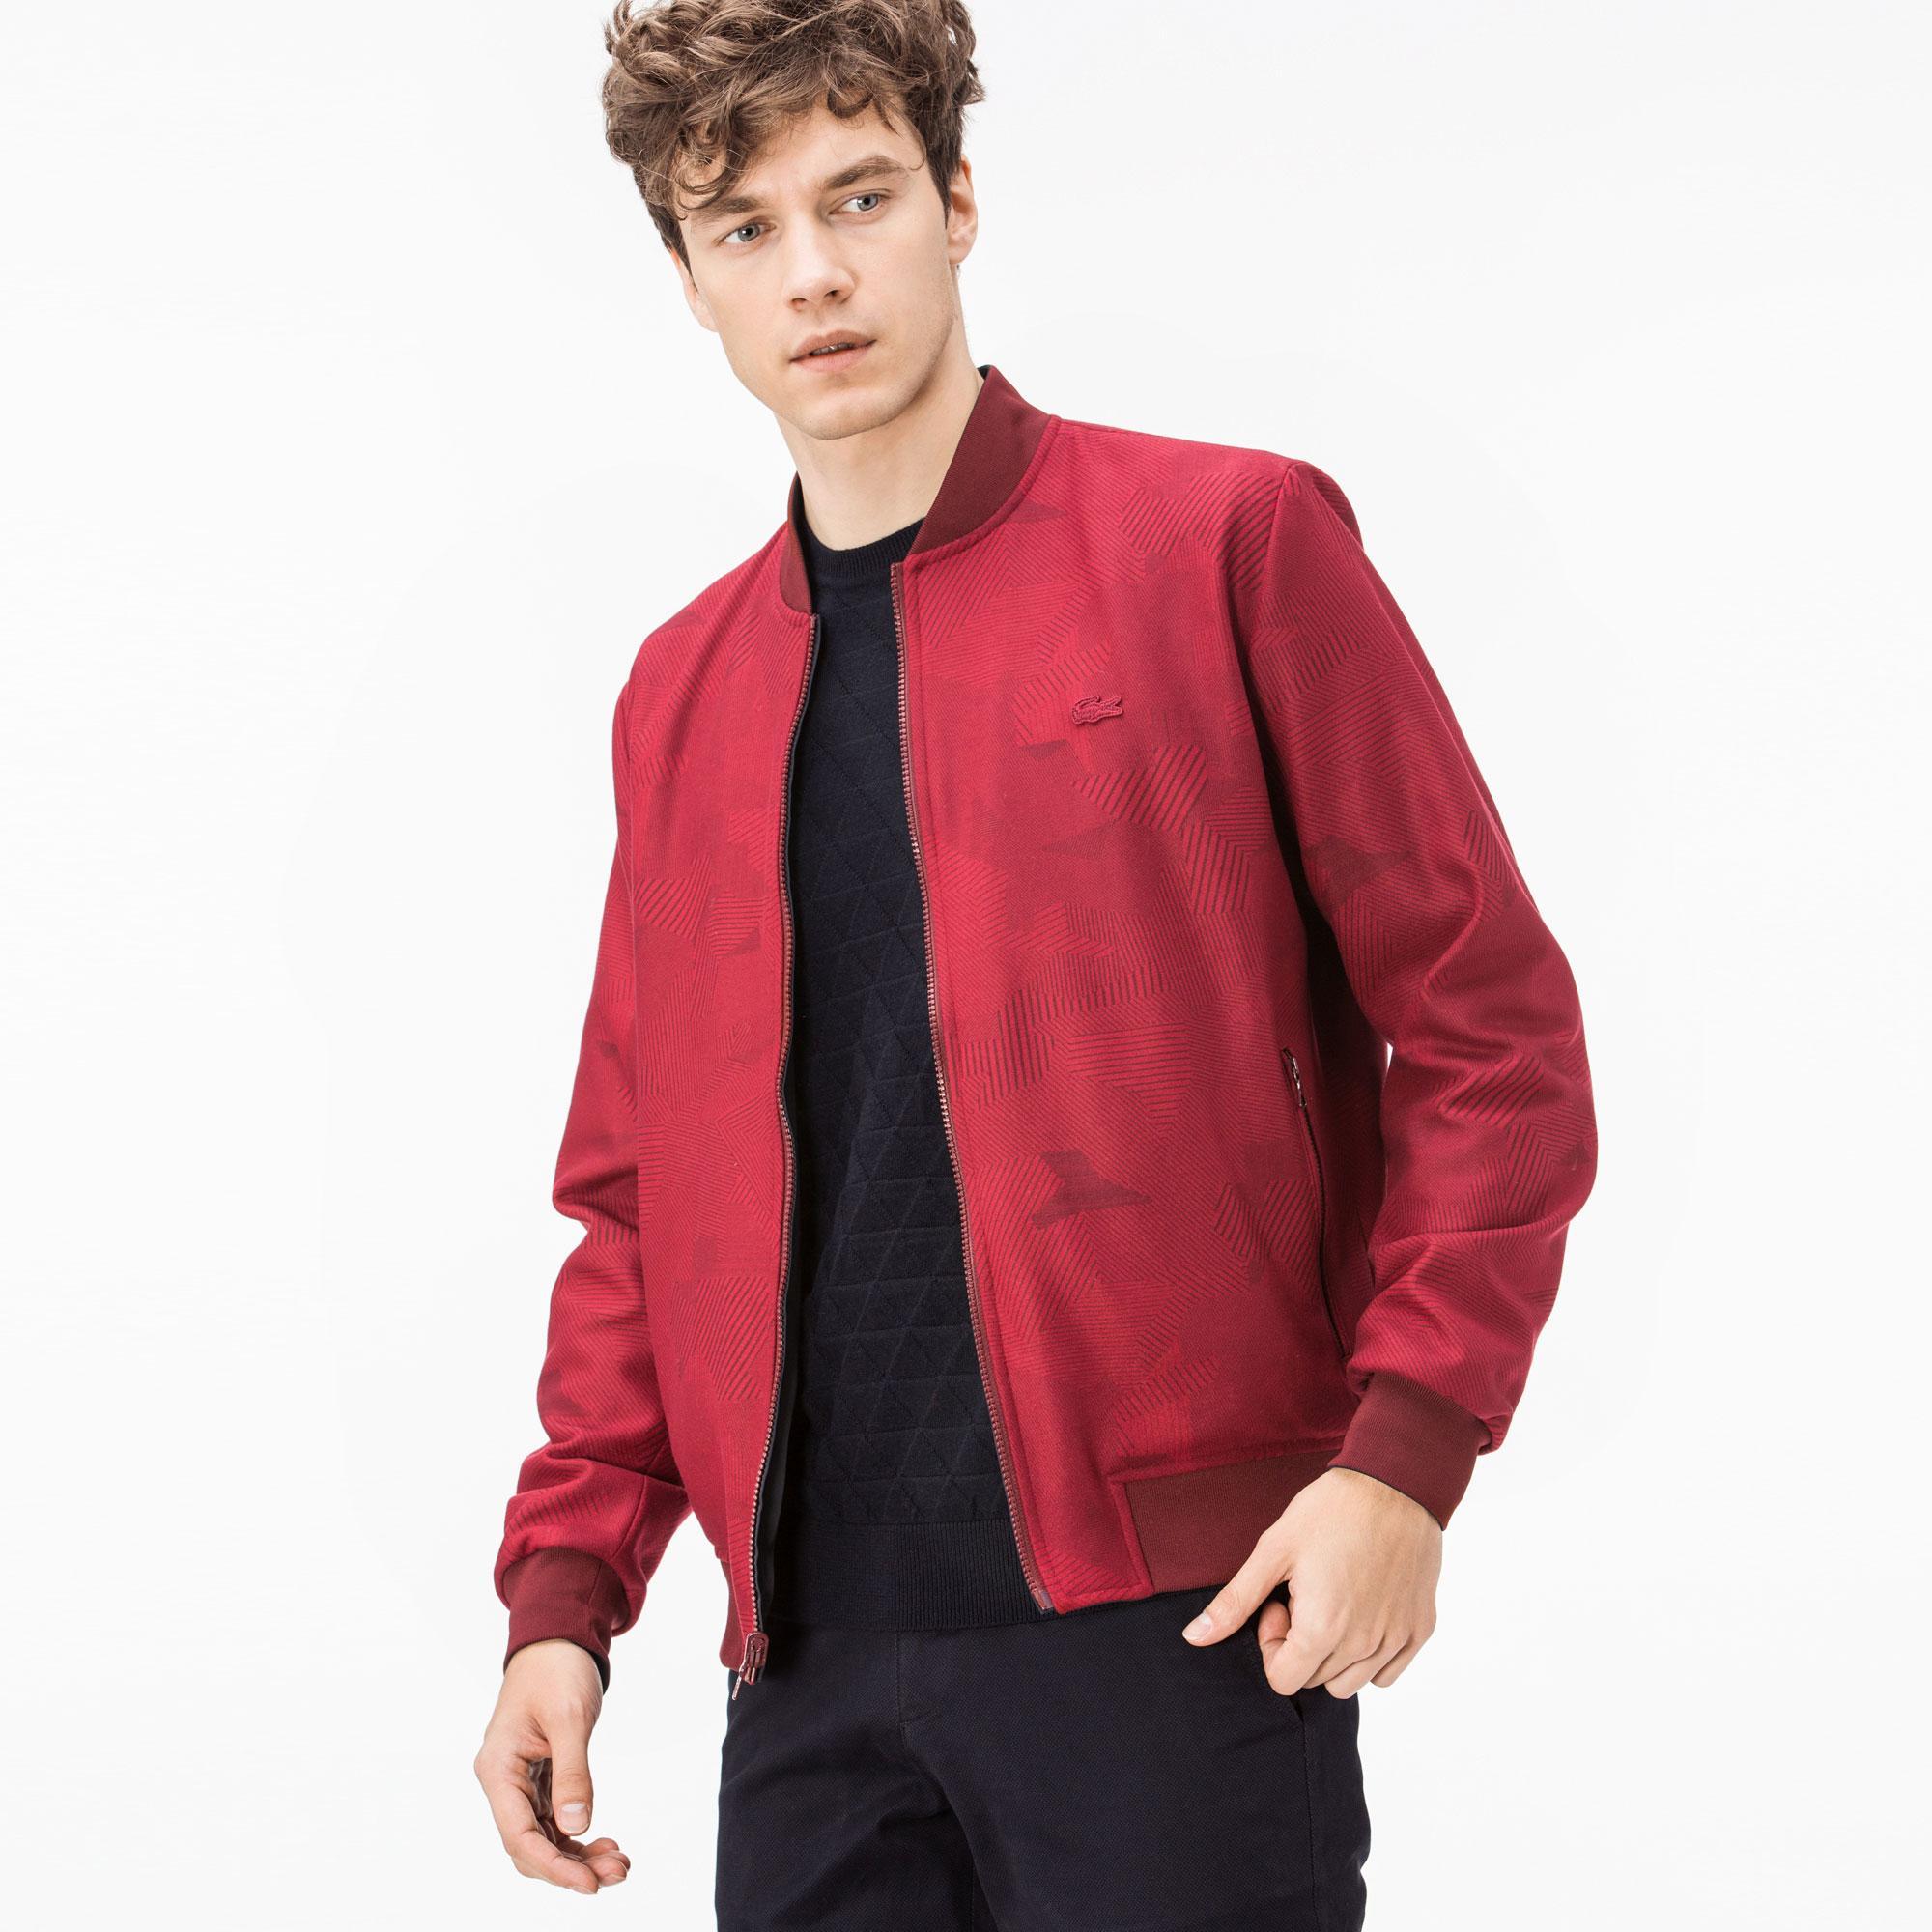 Lacoste Erkek Kırmızı-Lacivert Çift Taraflı Mont